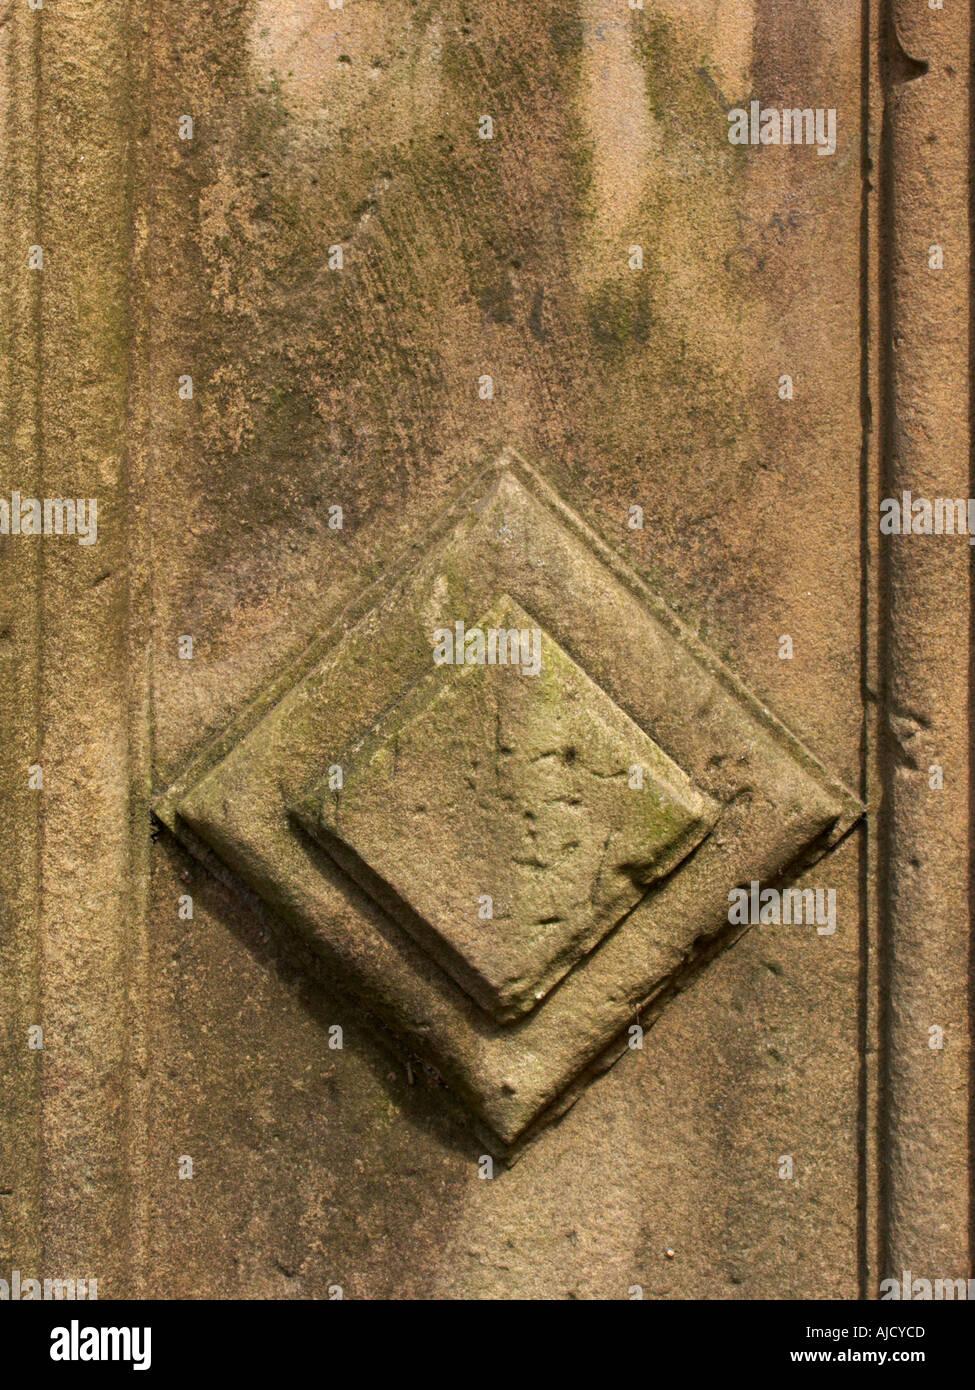 Diamond shape sculpted in stone gatepost Sandstone - Stock Image